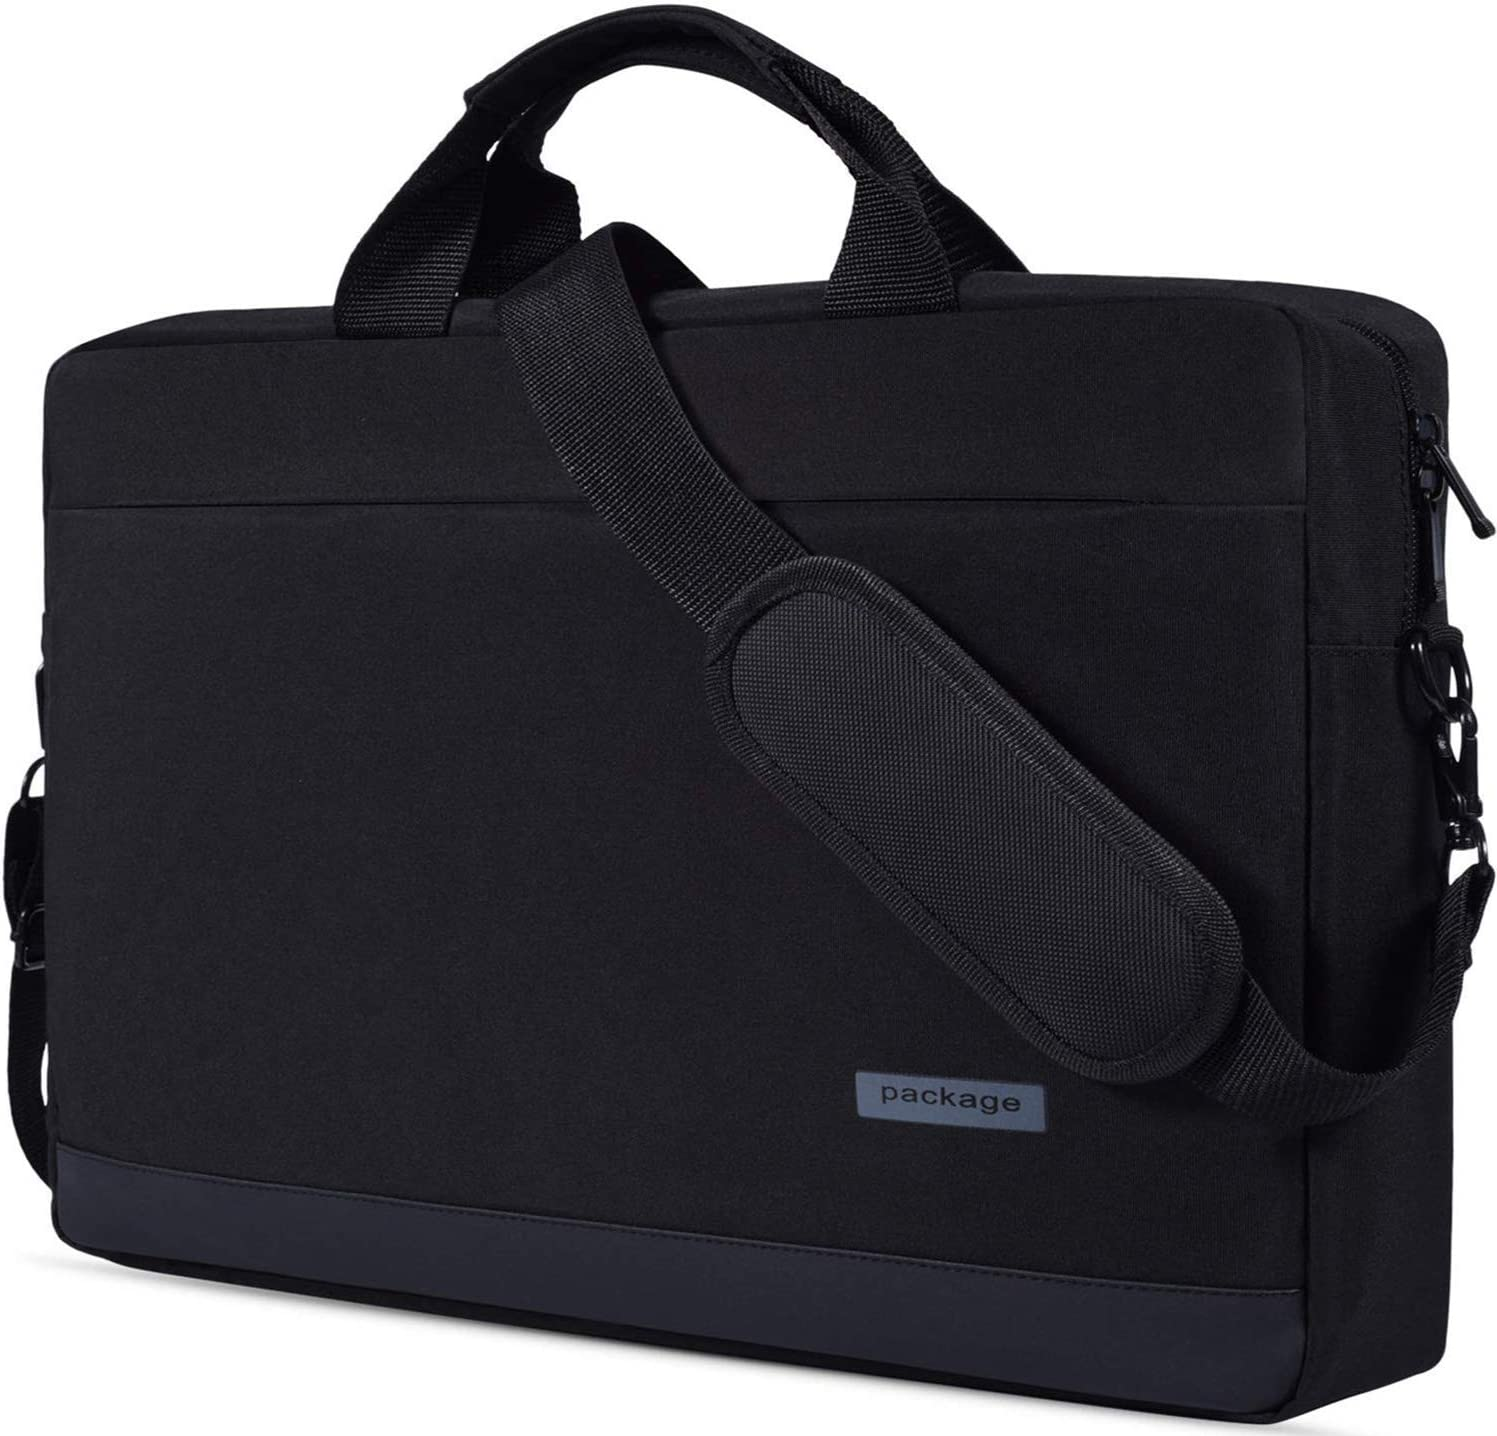 17-17.3 Inch Laptop Bag for ASUS VivoBook Pro 17/ASUS TUF/ASUS ROG 17.3, MSI GL73/MSI GF75, LG gram 17, Dell Inspiron 17, HP ENVY/Pavilion 17, Acer Predator 17, Lenovo, 17 17.3 inch Laptop Sleeve Case